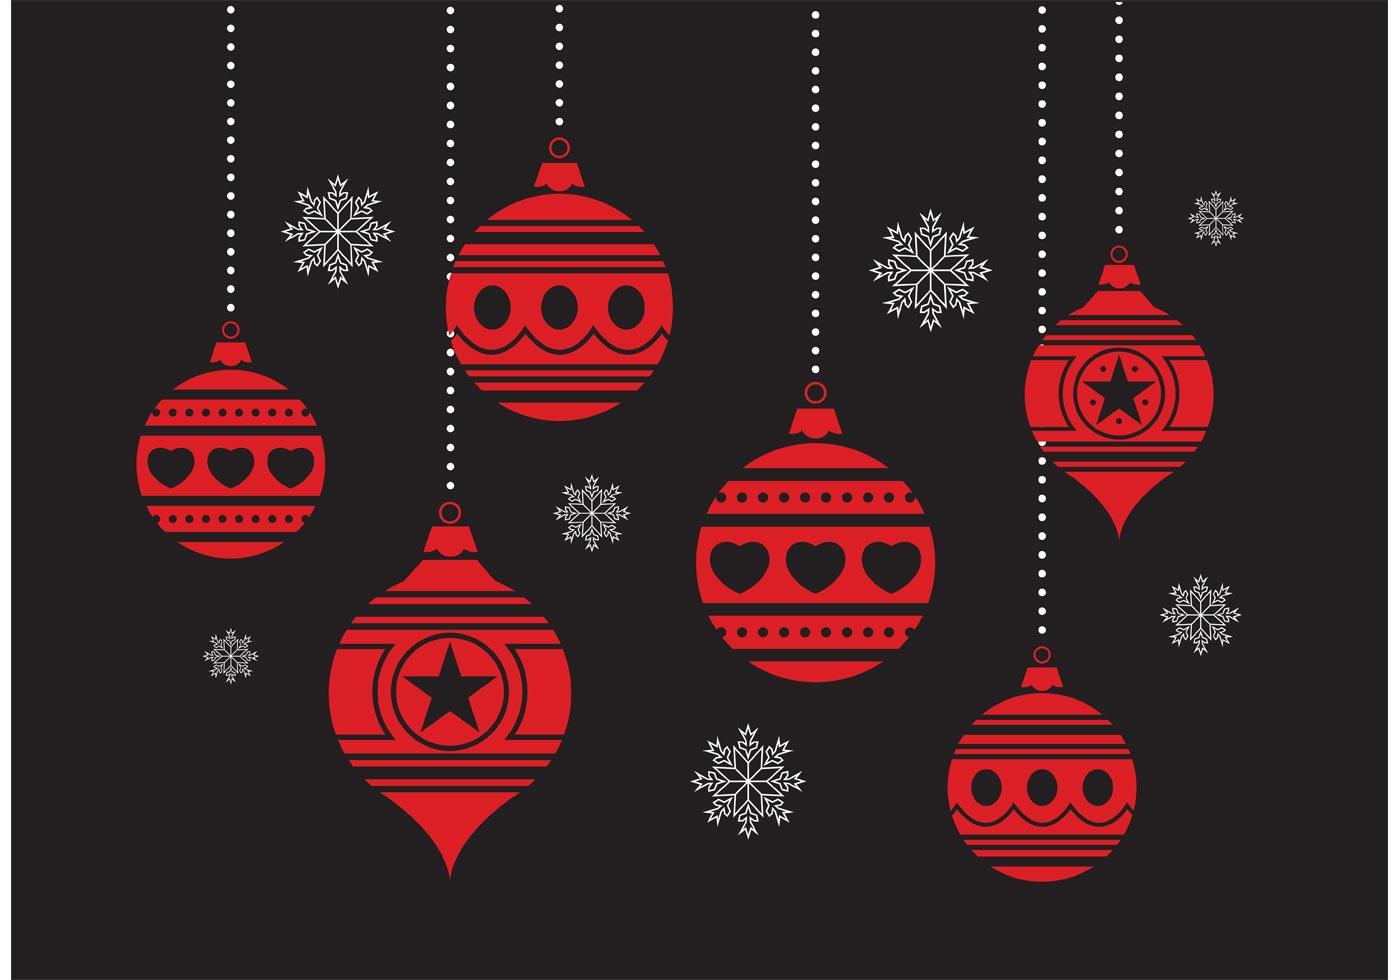 Christmas Ornament Set - Download Free Vector Art, Stock ...